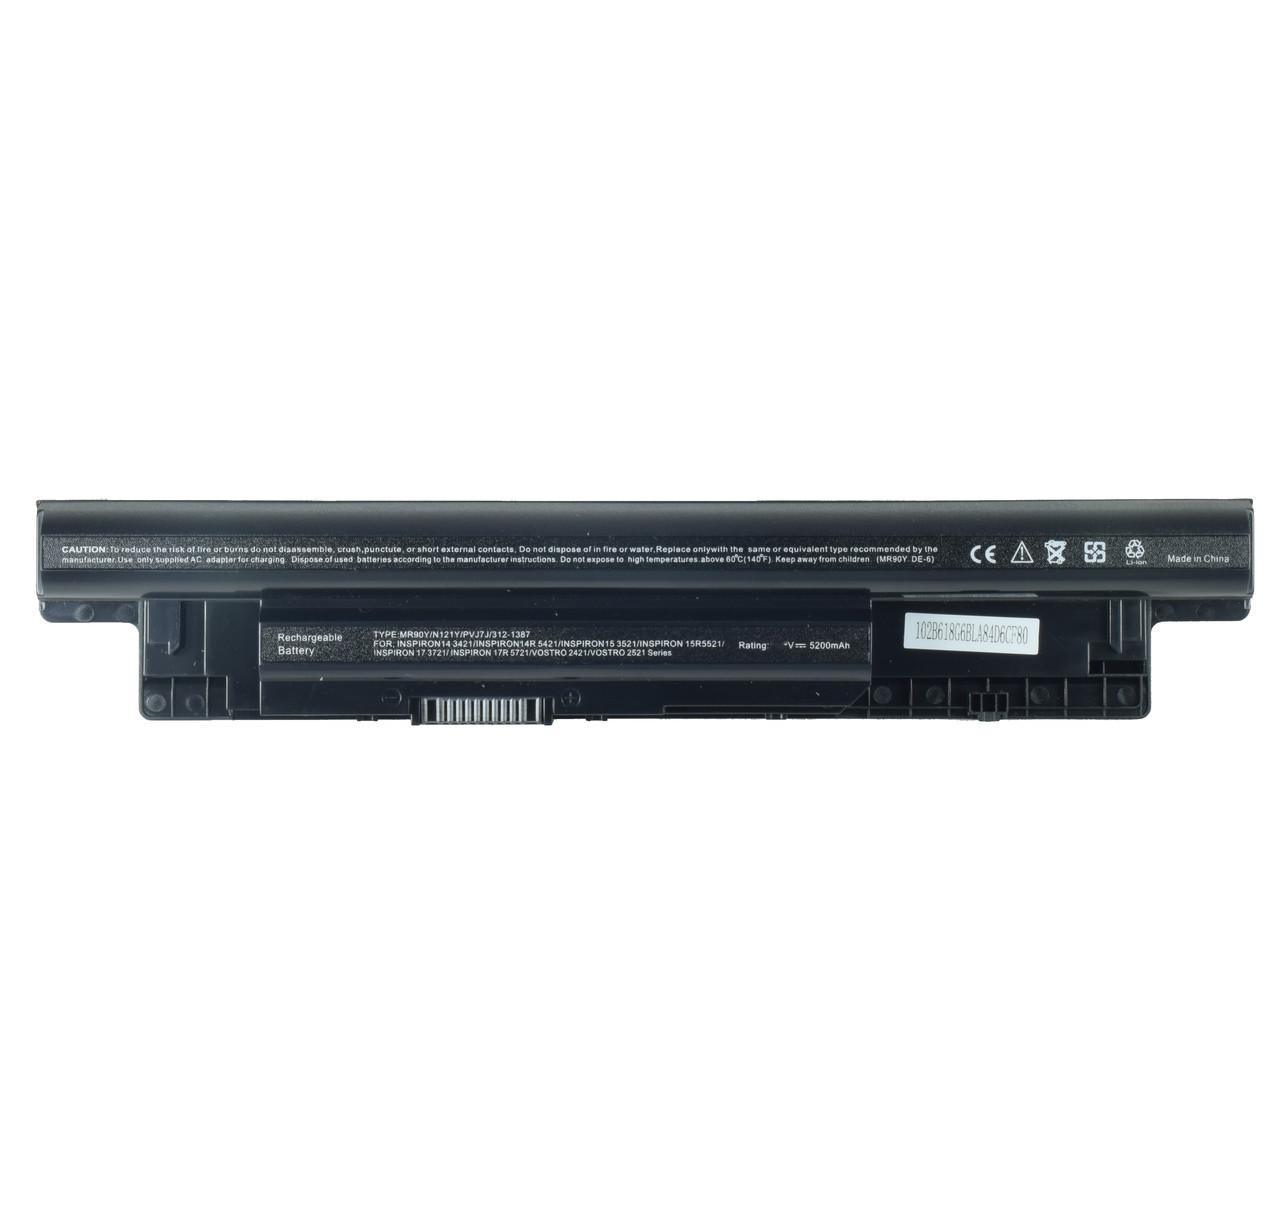 Батарея для ноутбука DELL Inspiron  6XH00 9K1VP FW1MN G019Y G35K4 MK1R0 MR90Y PVJ7J V8VNT X29KD 14.4 В